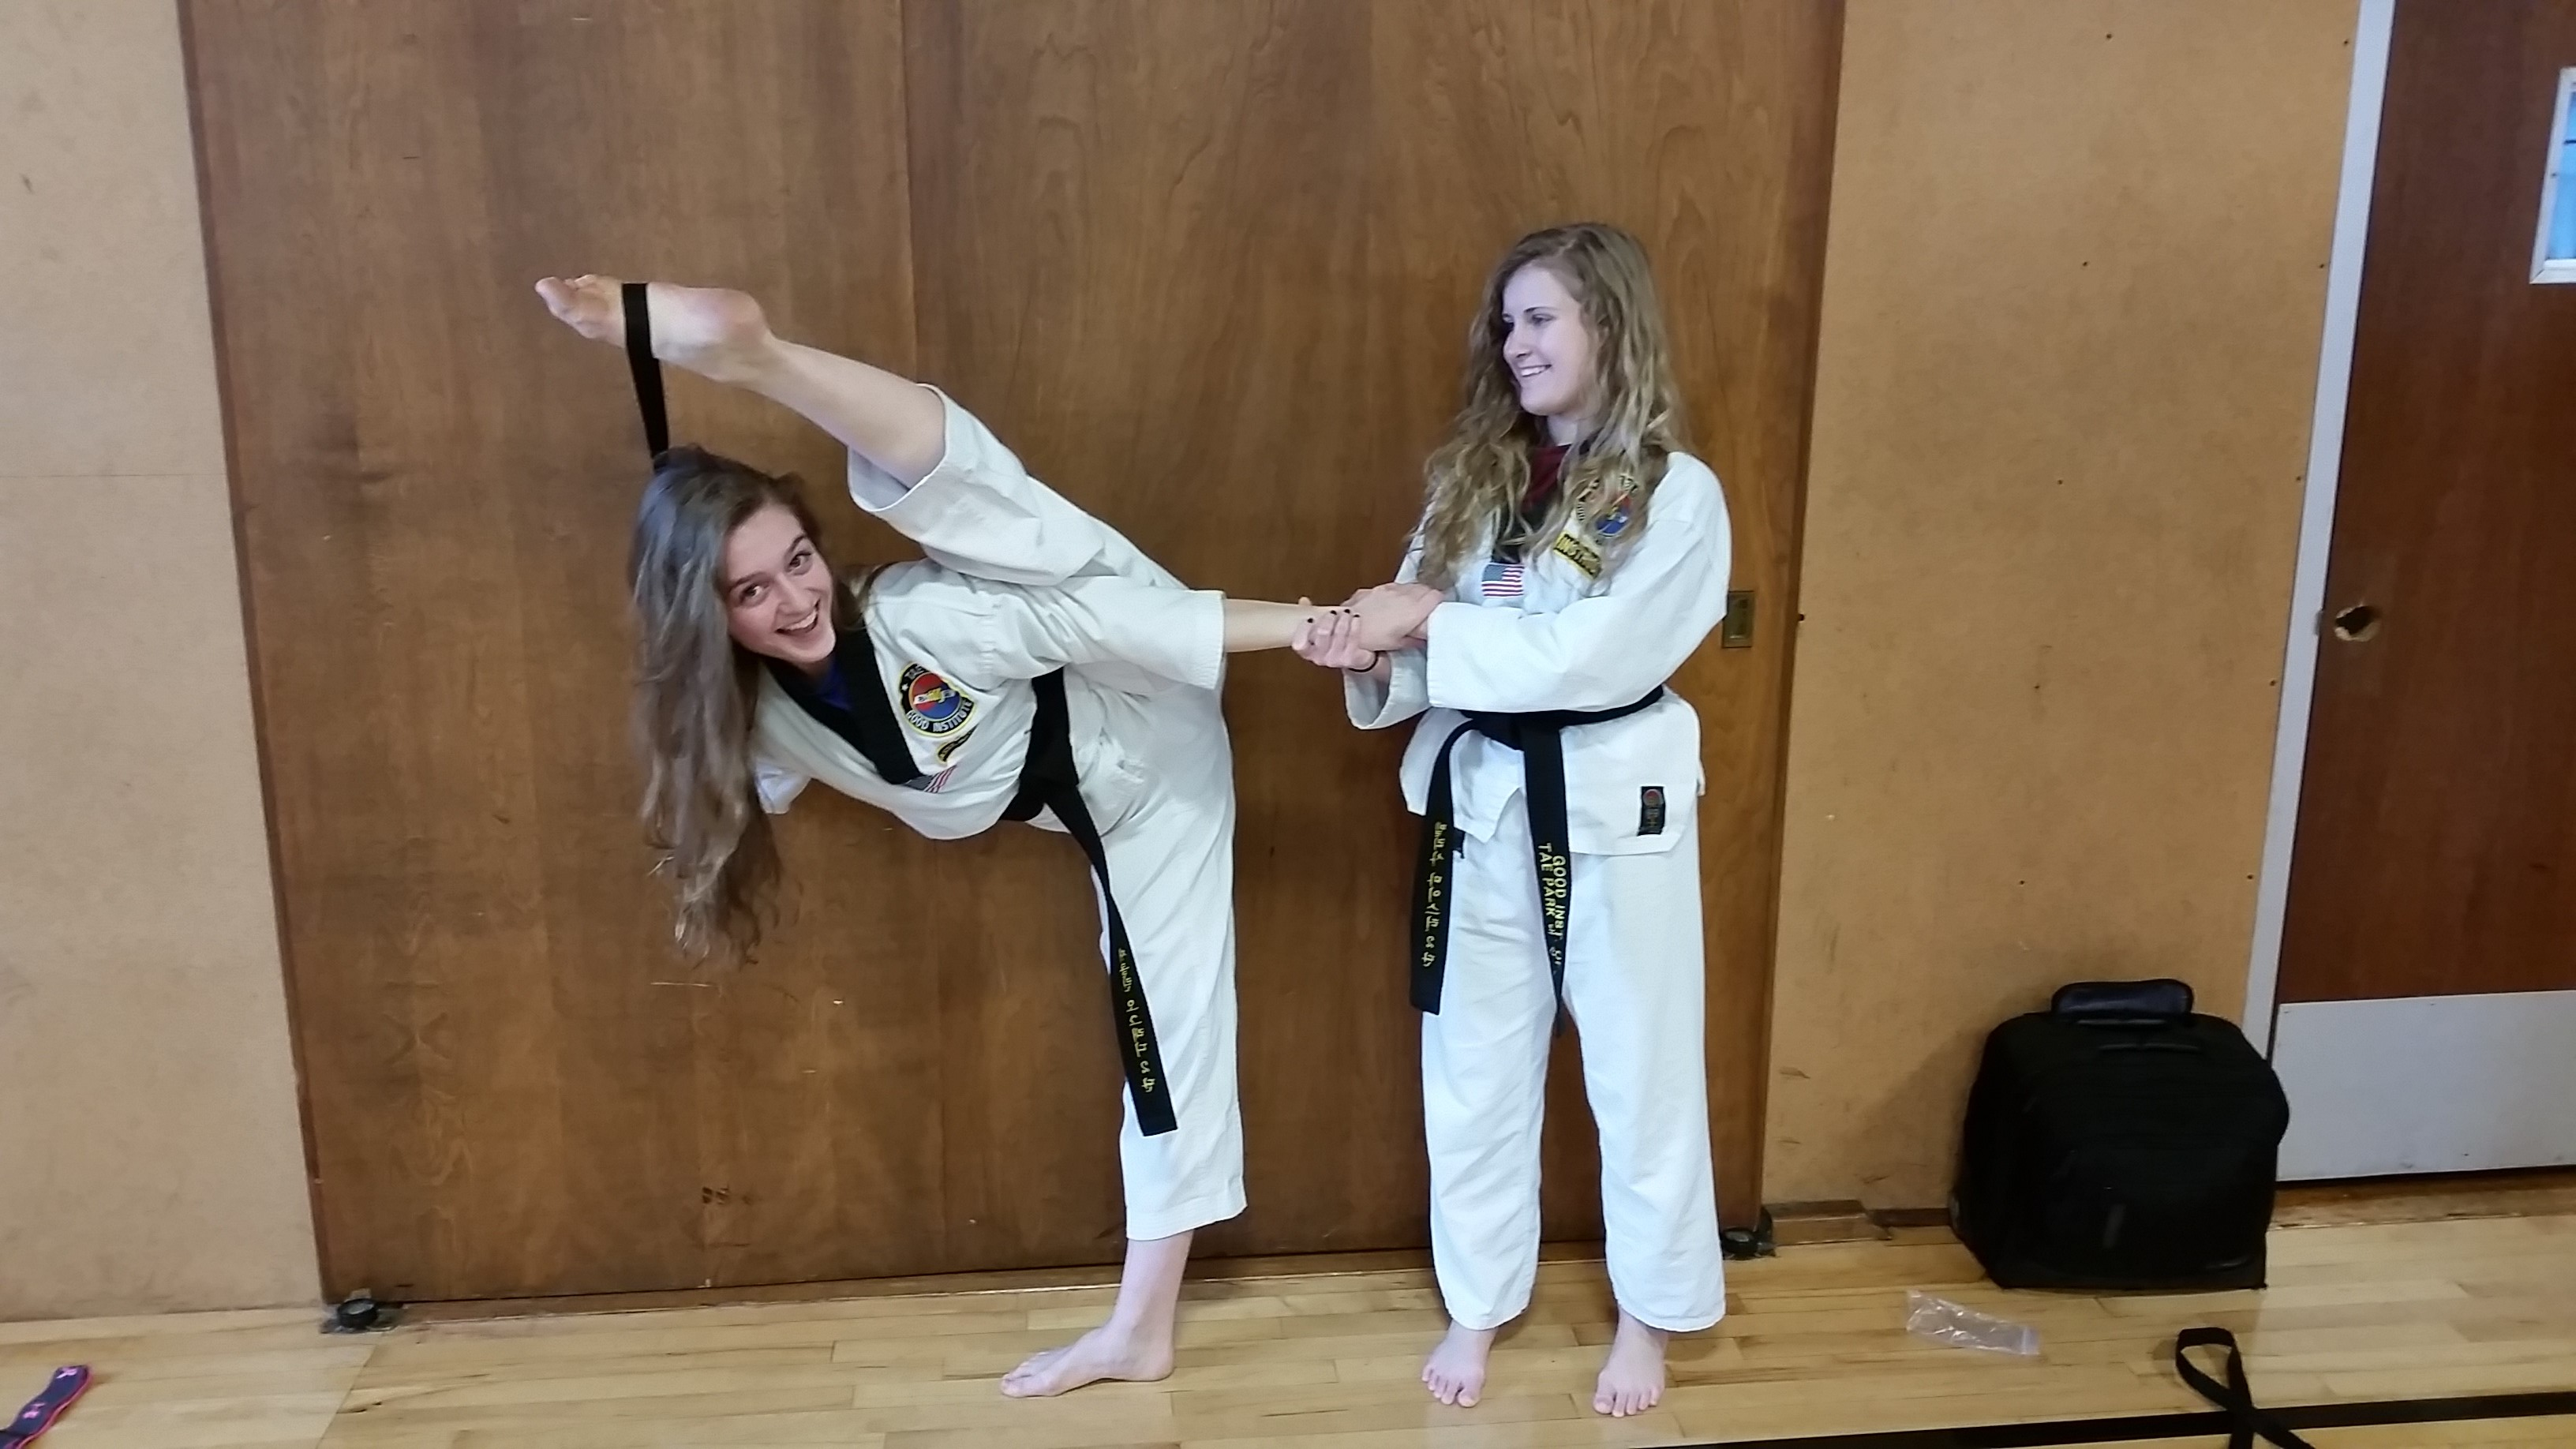 Hot taekwondo girl nude — pic 10